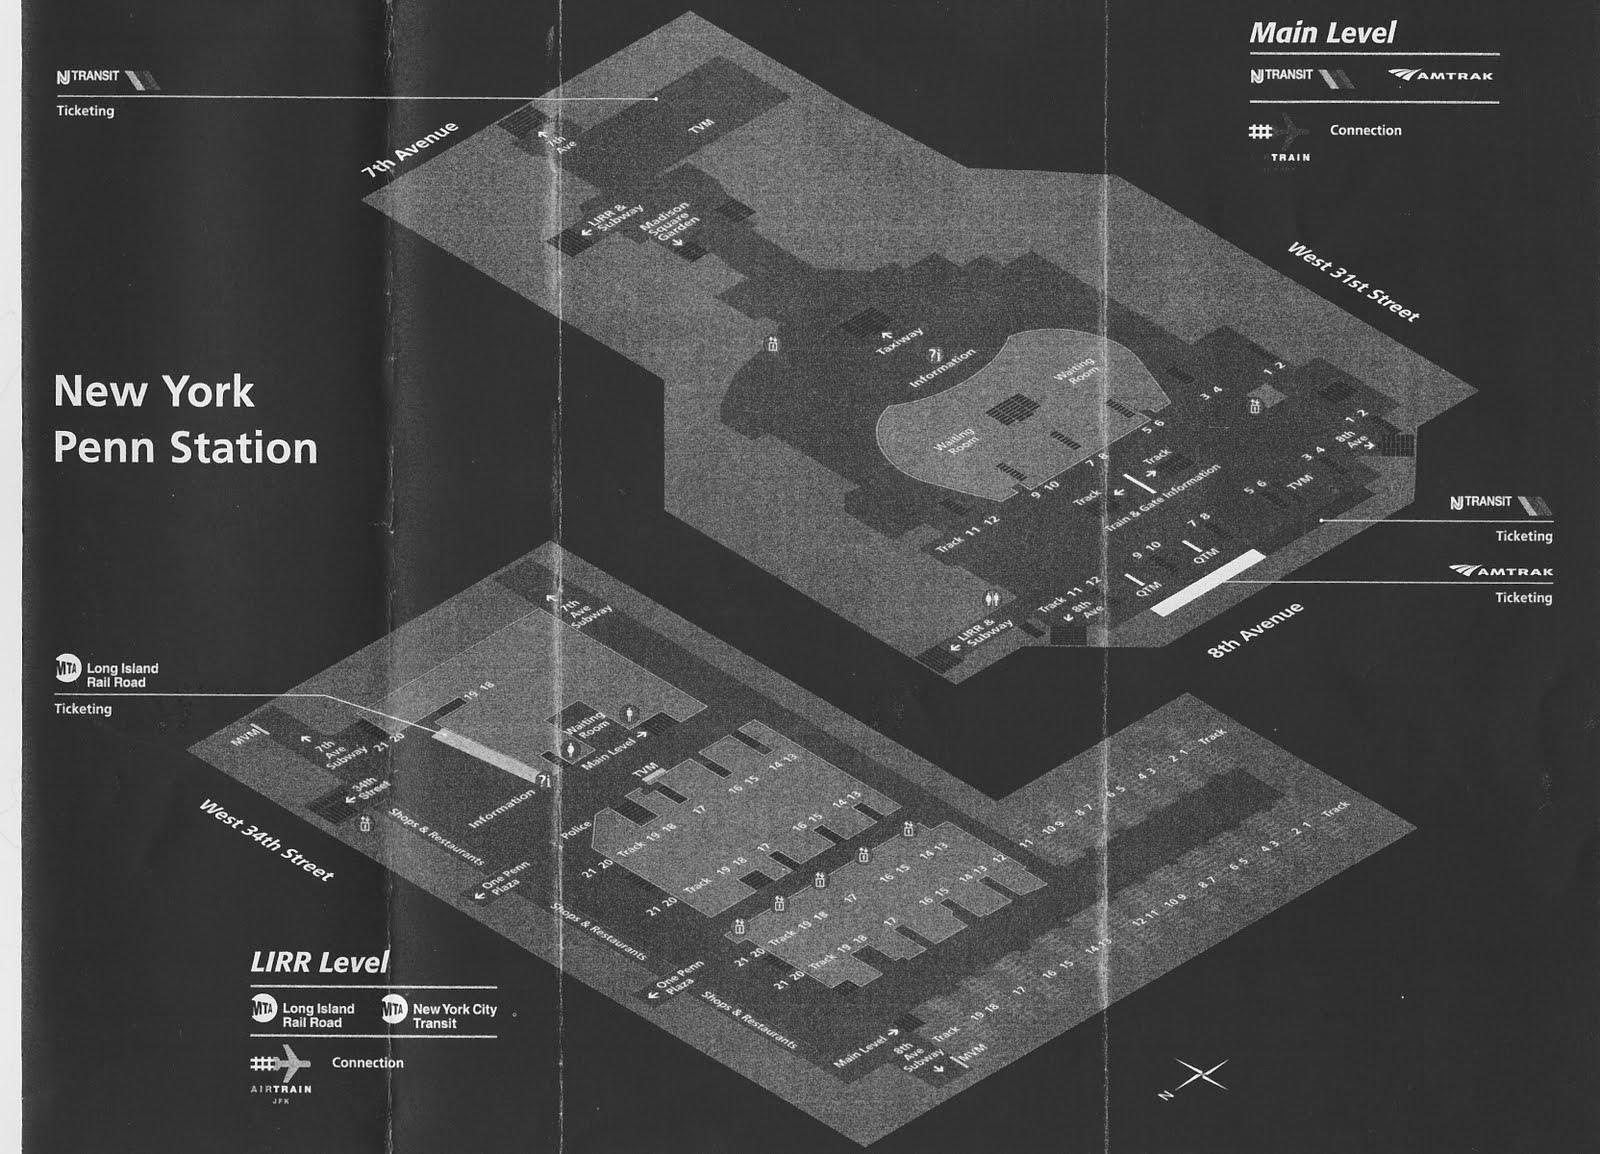 Map Of New York Penn Station.Penn Station Pathfinder Ephemera